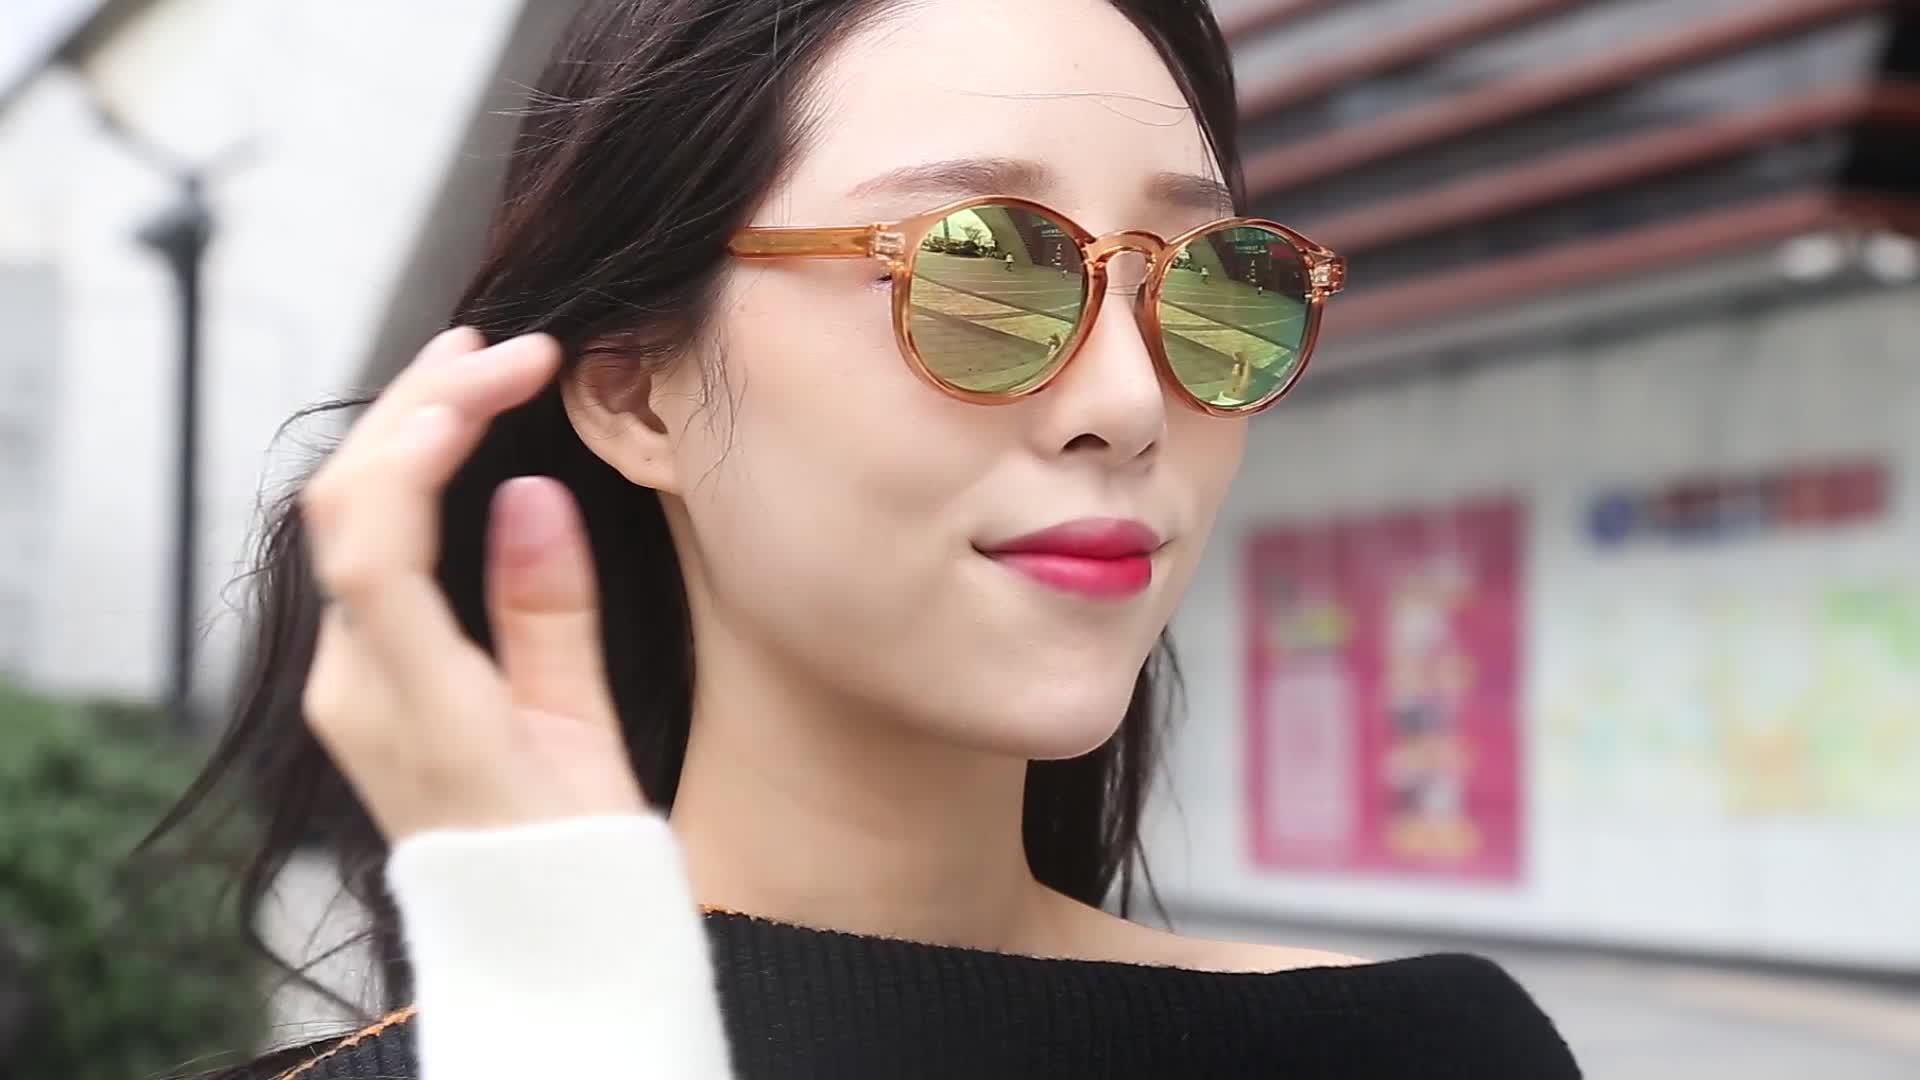 2019 Hot Selling Custom Fashion Ladies Shades Retro Wholesale Fashionable Round Vintage Women Sun Glasses Sunglasses 2020